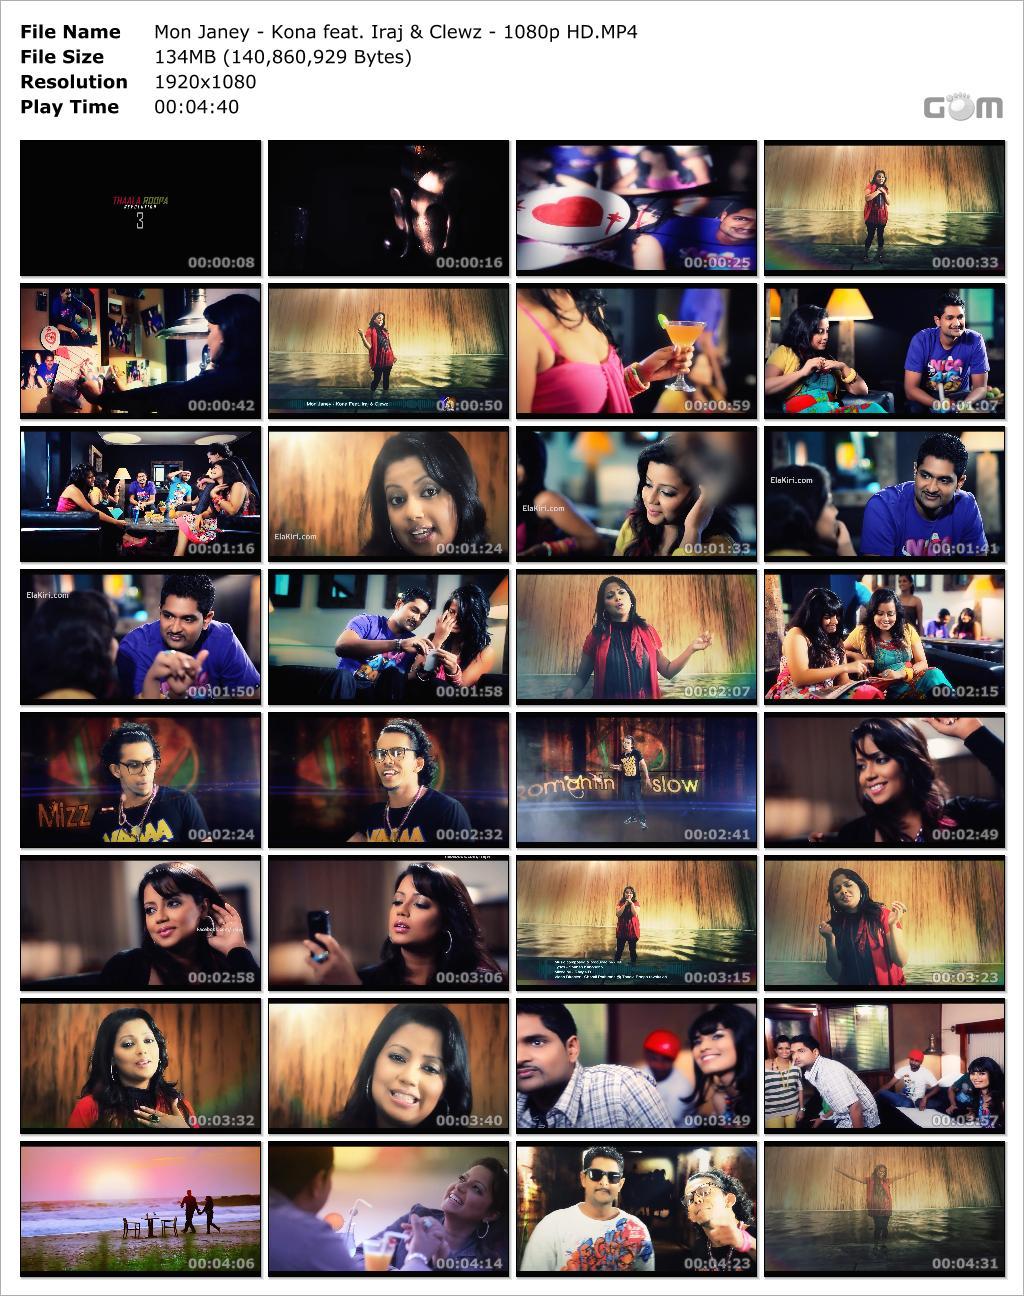 Mon Janey - Kona Feat. Iraj & Clewz- 1080 HD Video Download